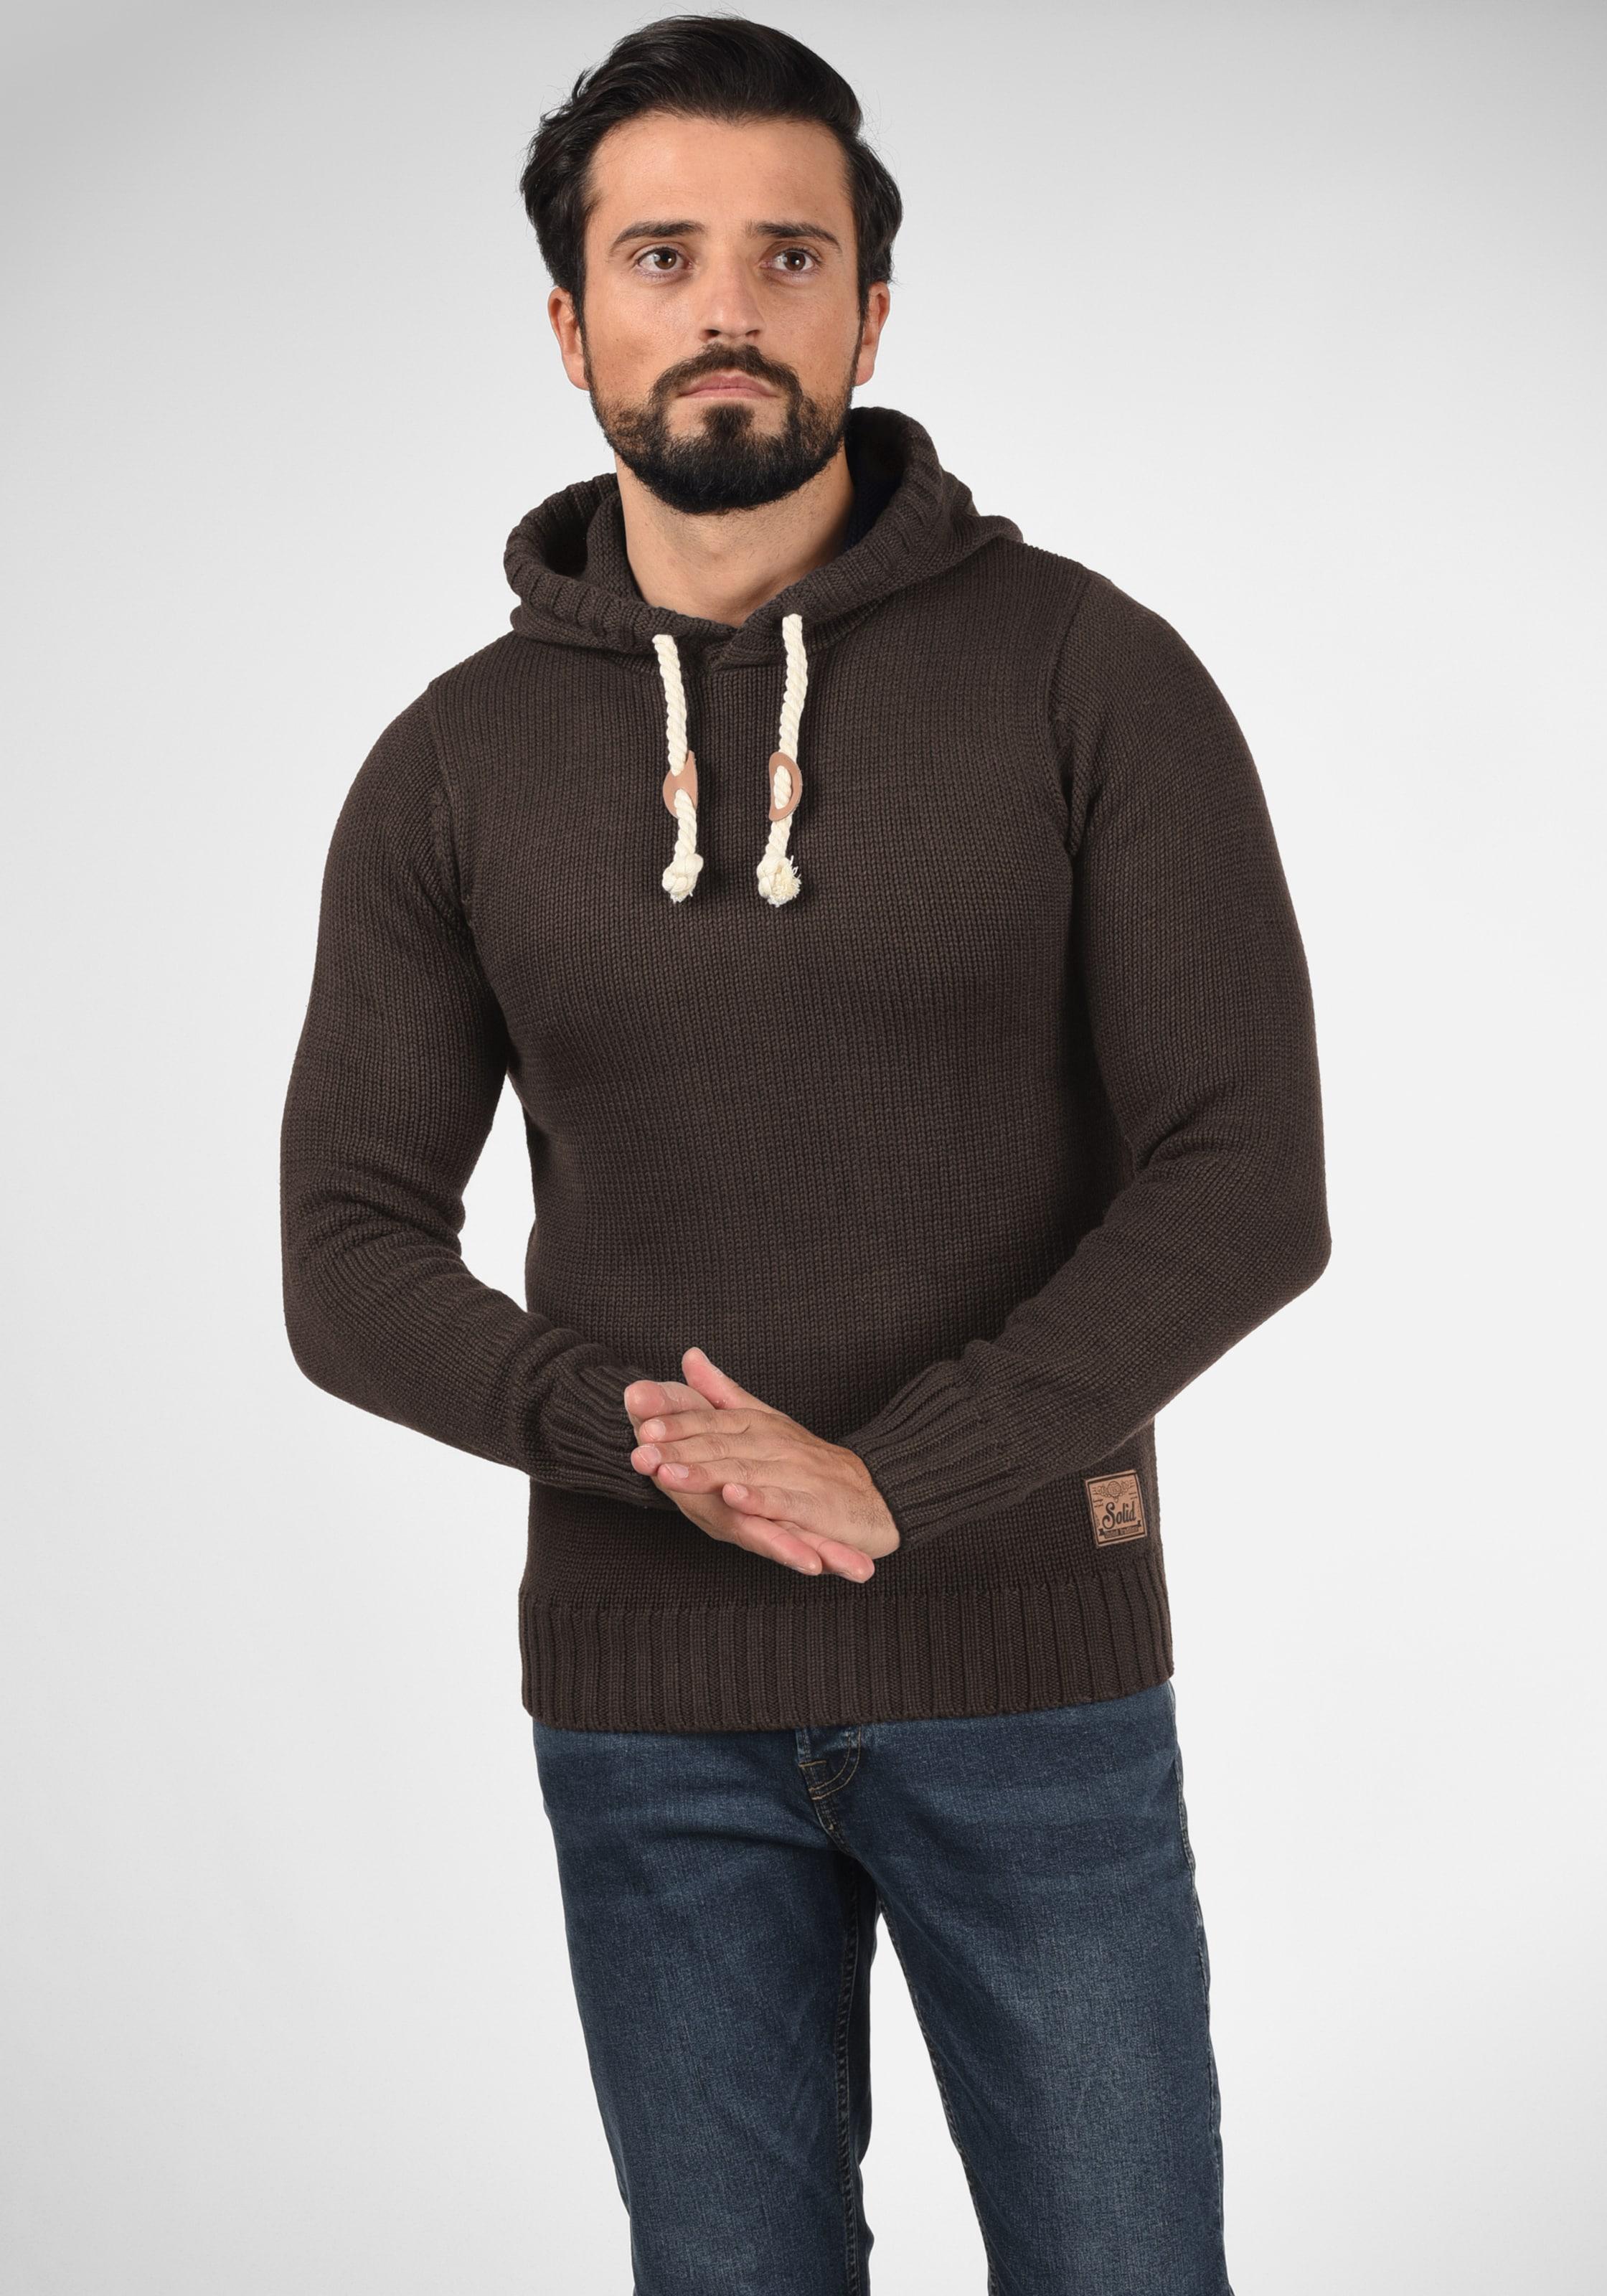 !Solid Pullover 'Pitu' in kastanienbraun Gerader Saum ART120140-006